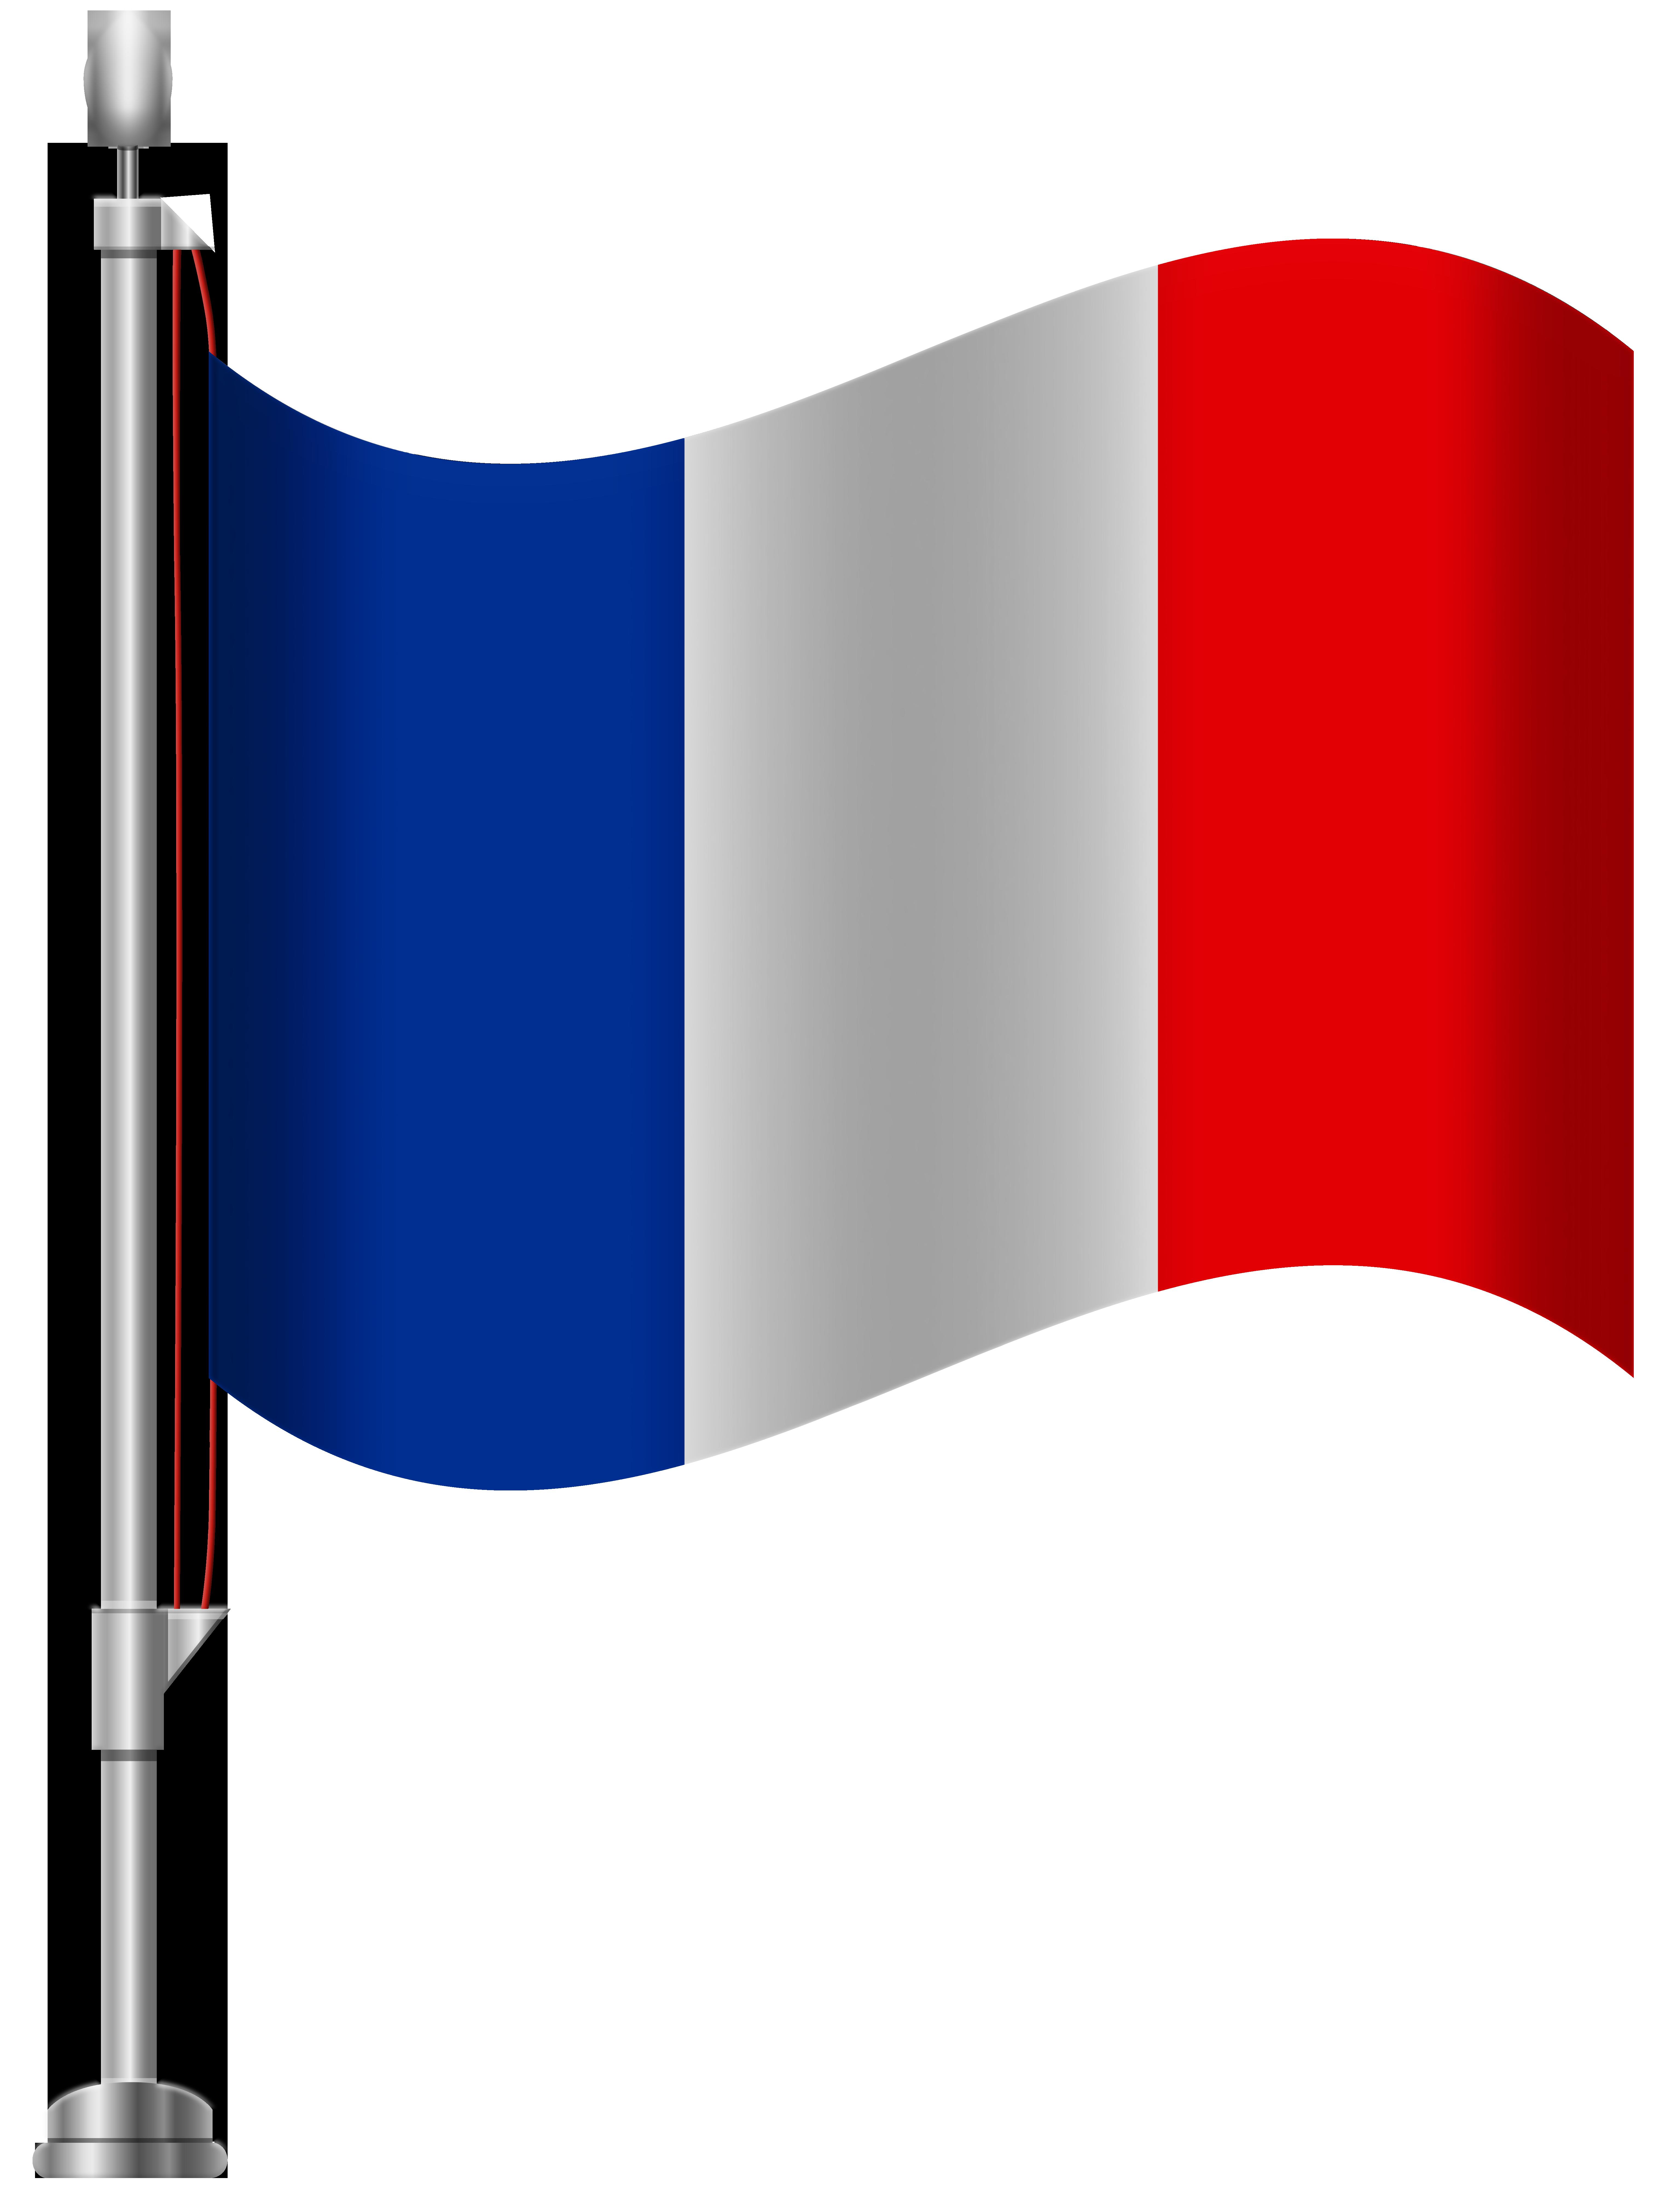 6141x8000 France Flag Png Clip Art